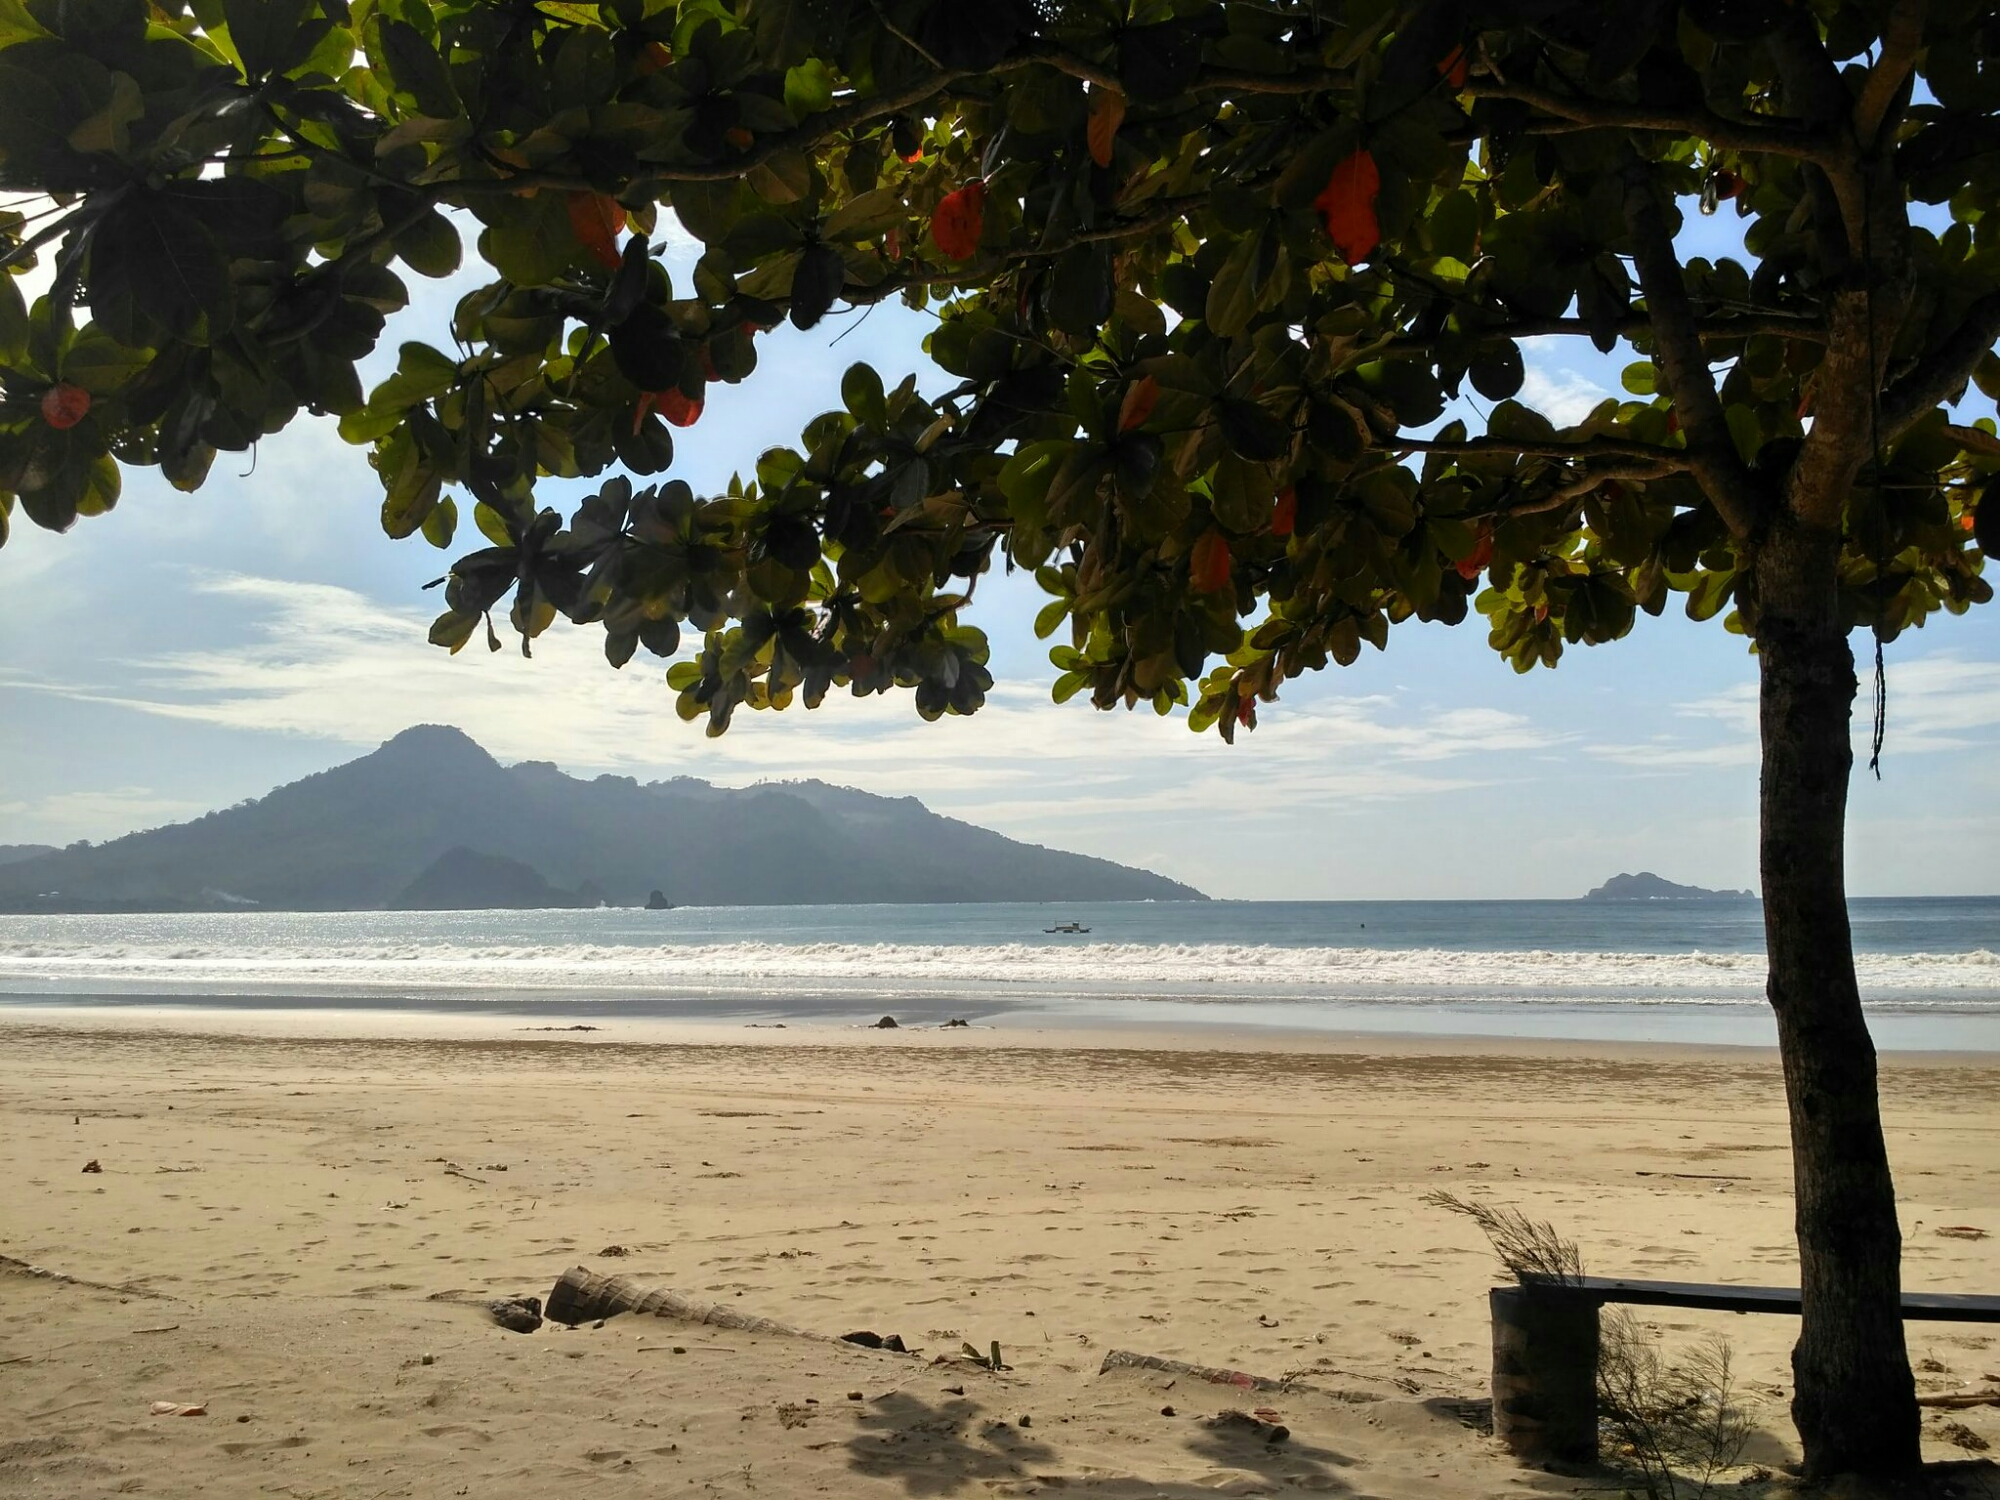 Pantai Mustika Pancer Pesanggaran Banyuwangi Semakin Bersinar Terletak Dusun Sumberagung